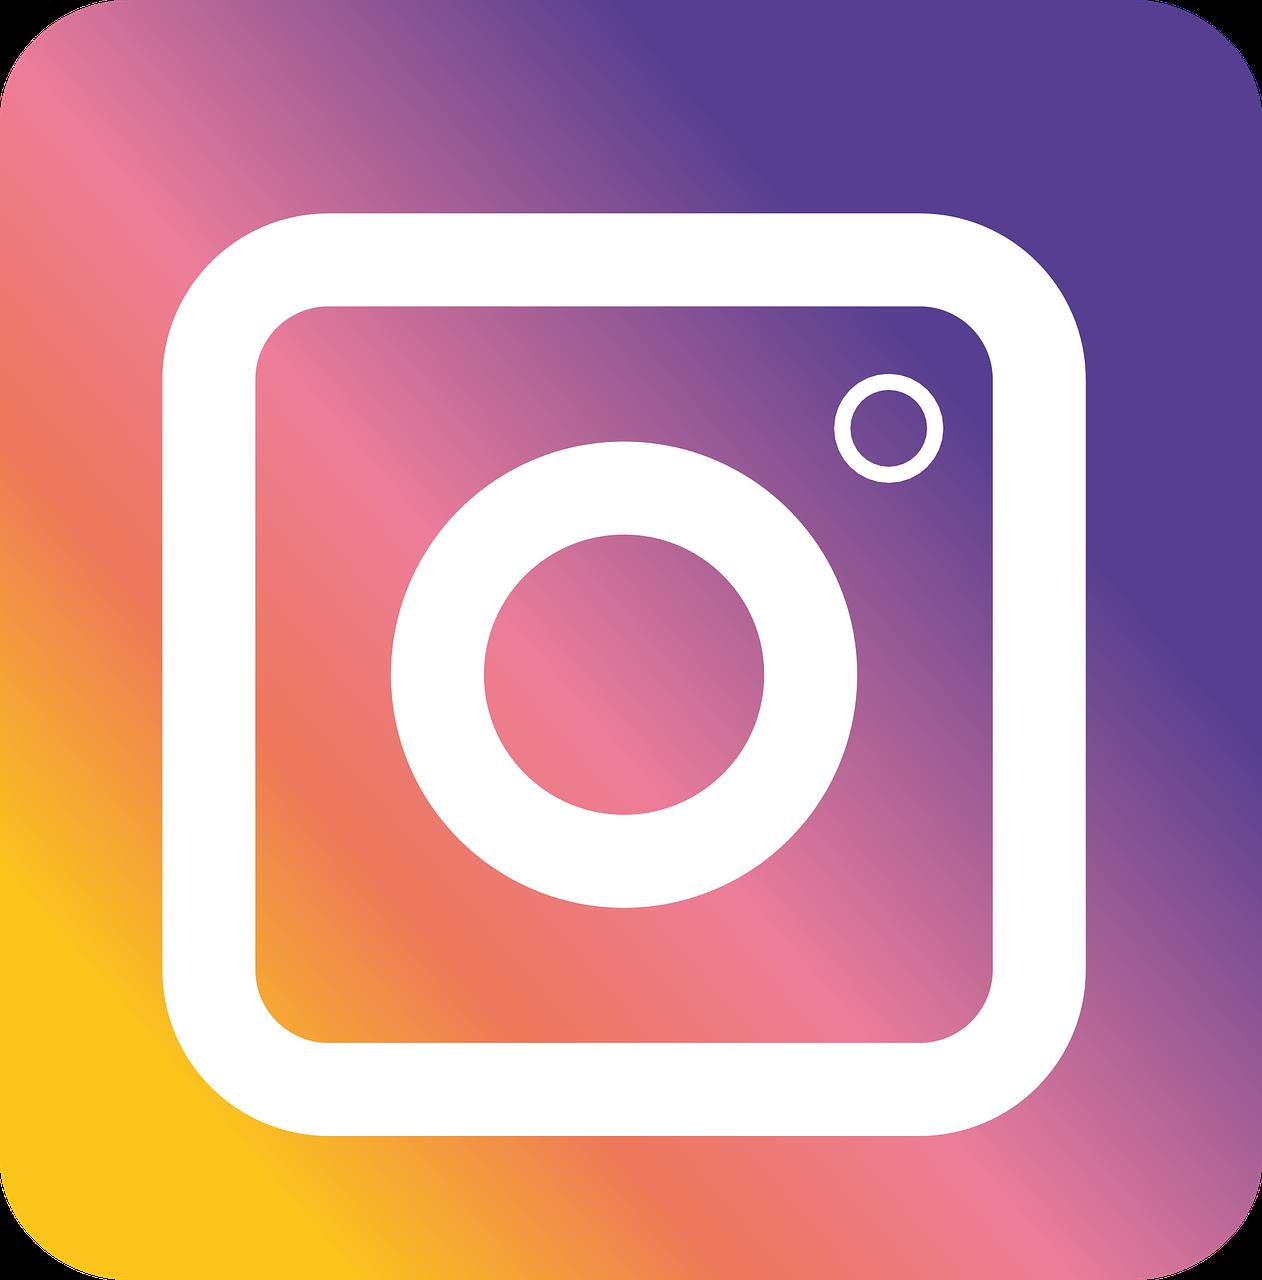 Bertha-News bei Instagramm